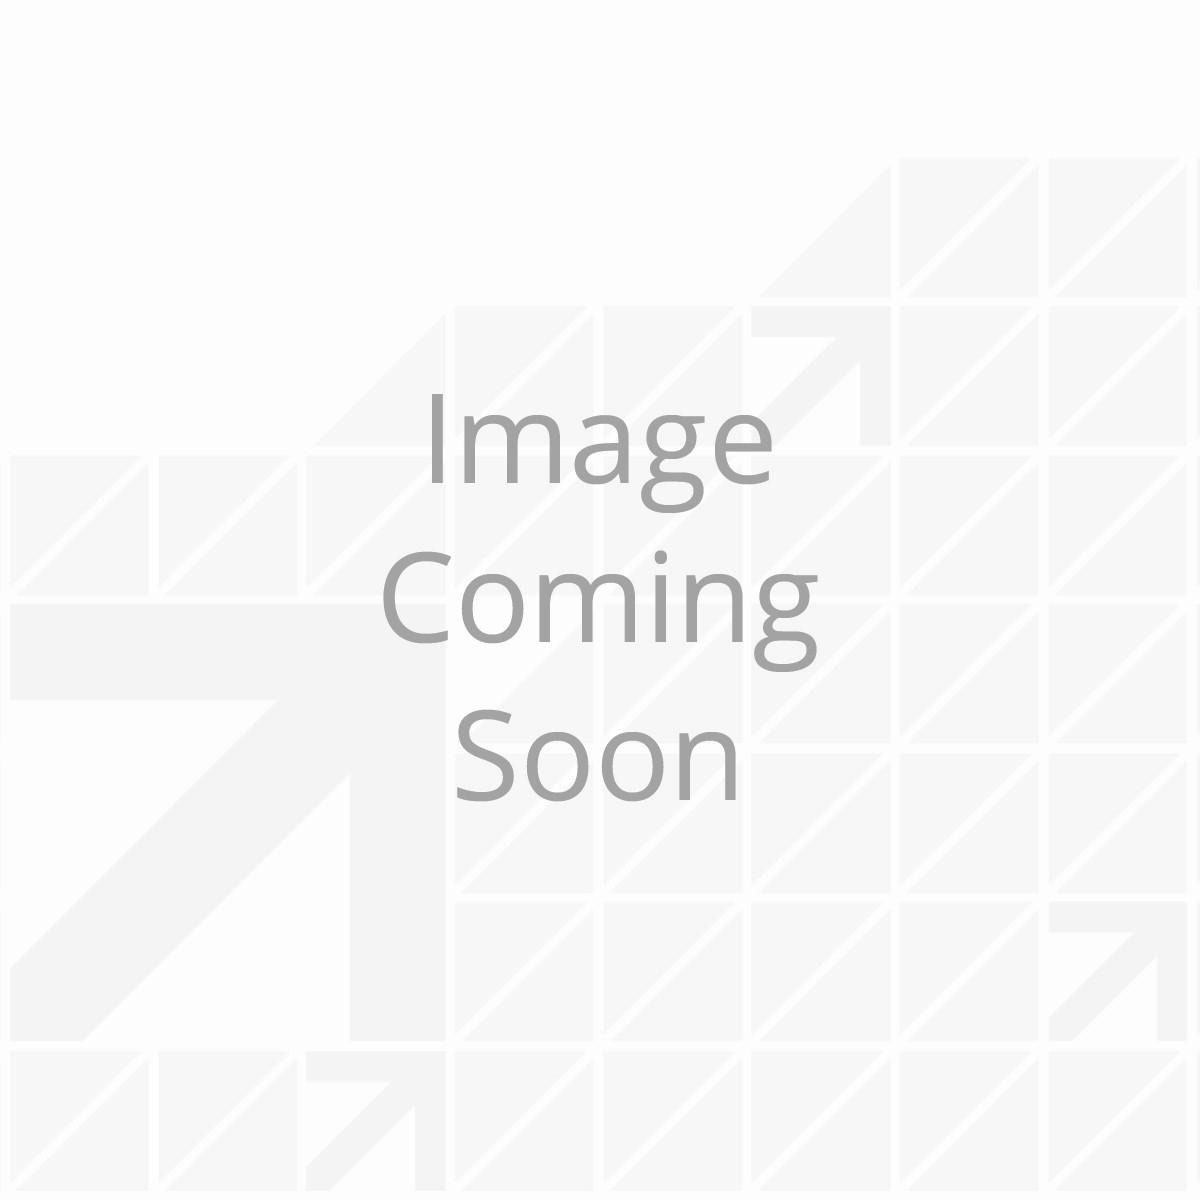 latch-w-actuator-bridge-connector-keyless-entry